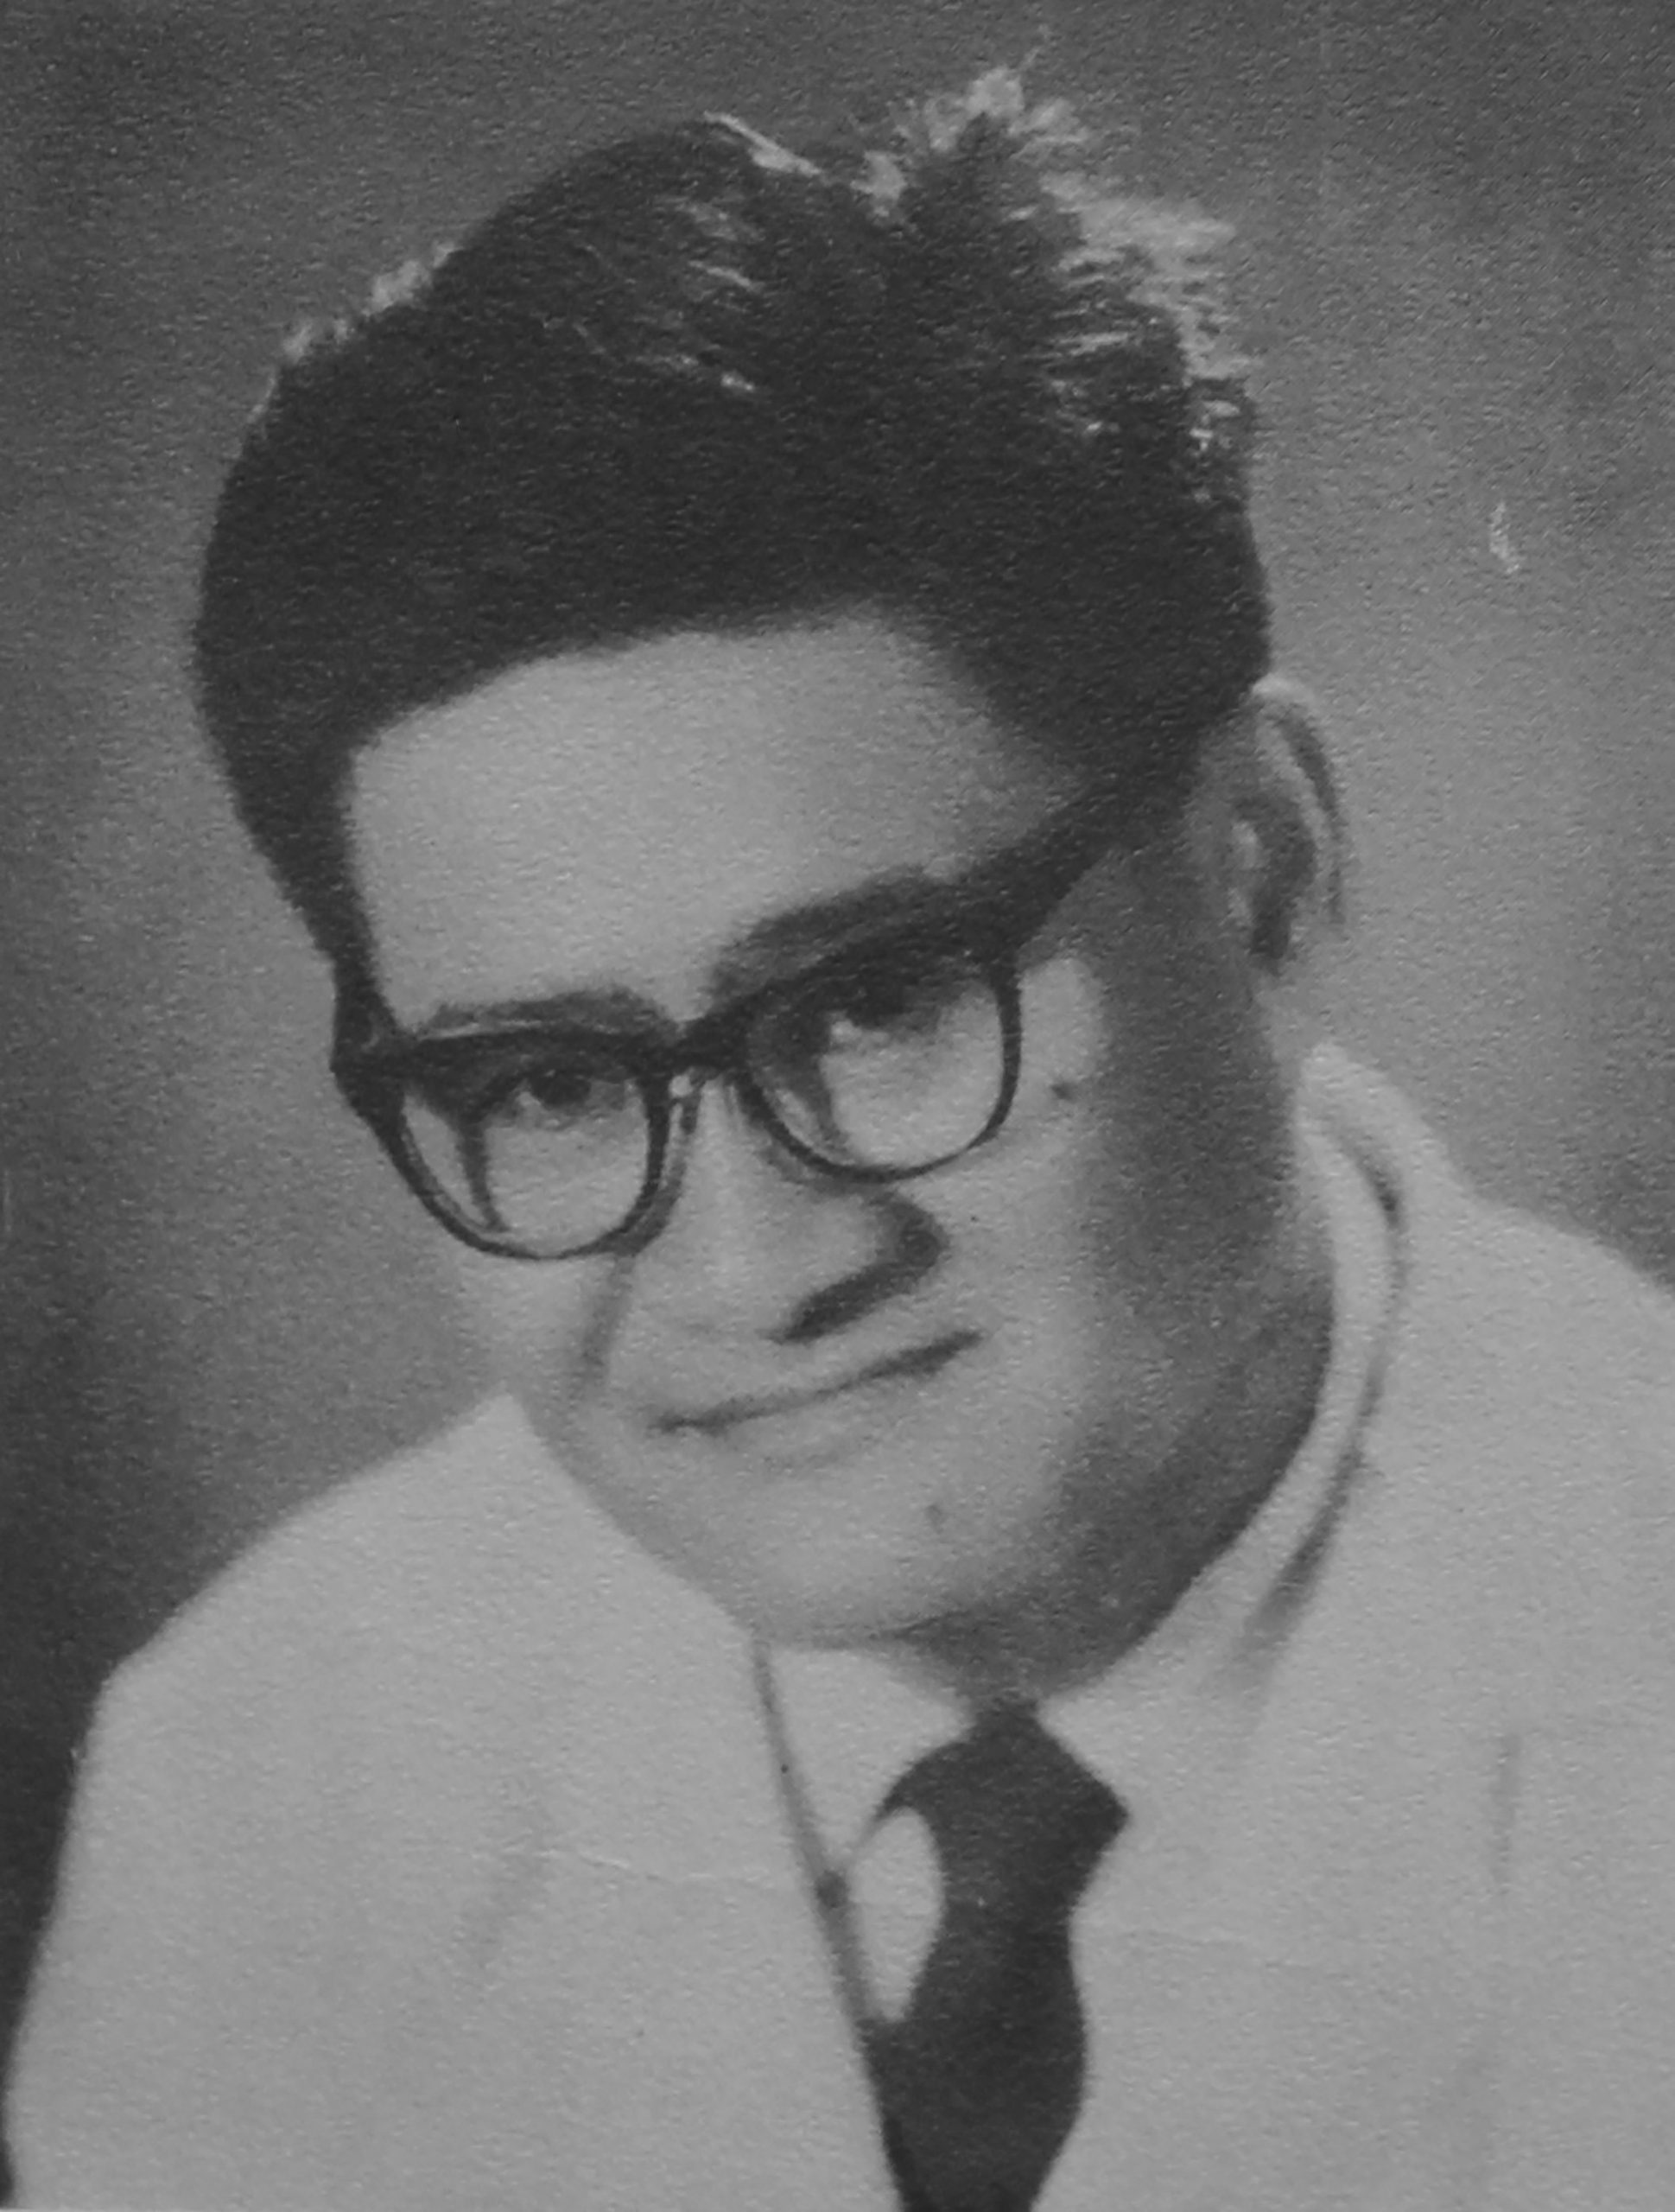 Dean of Men (1965-1967)